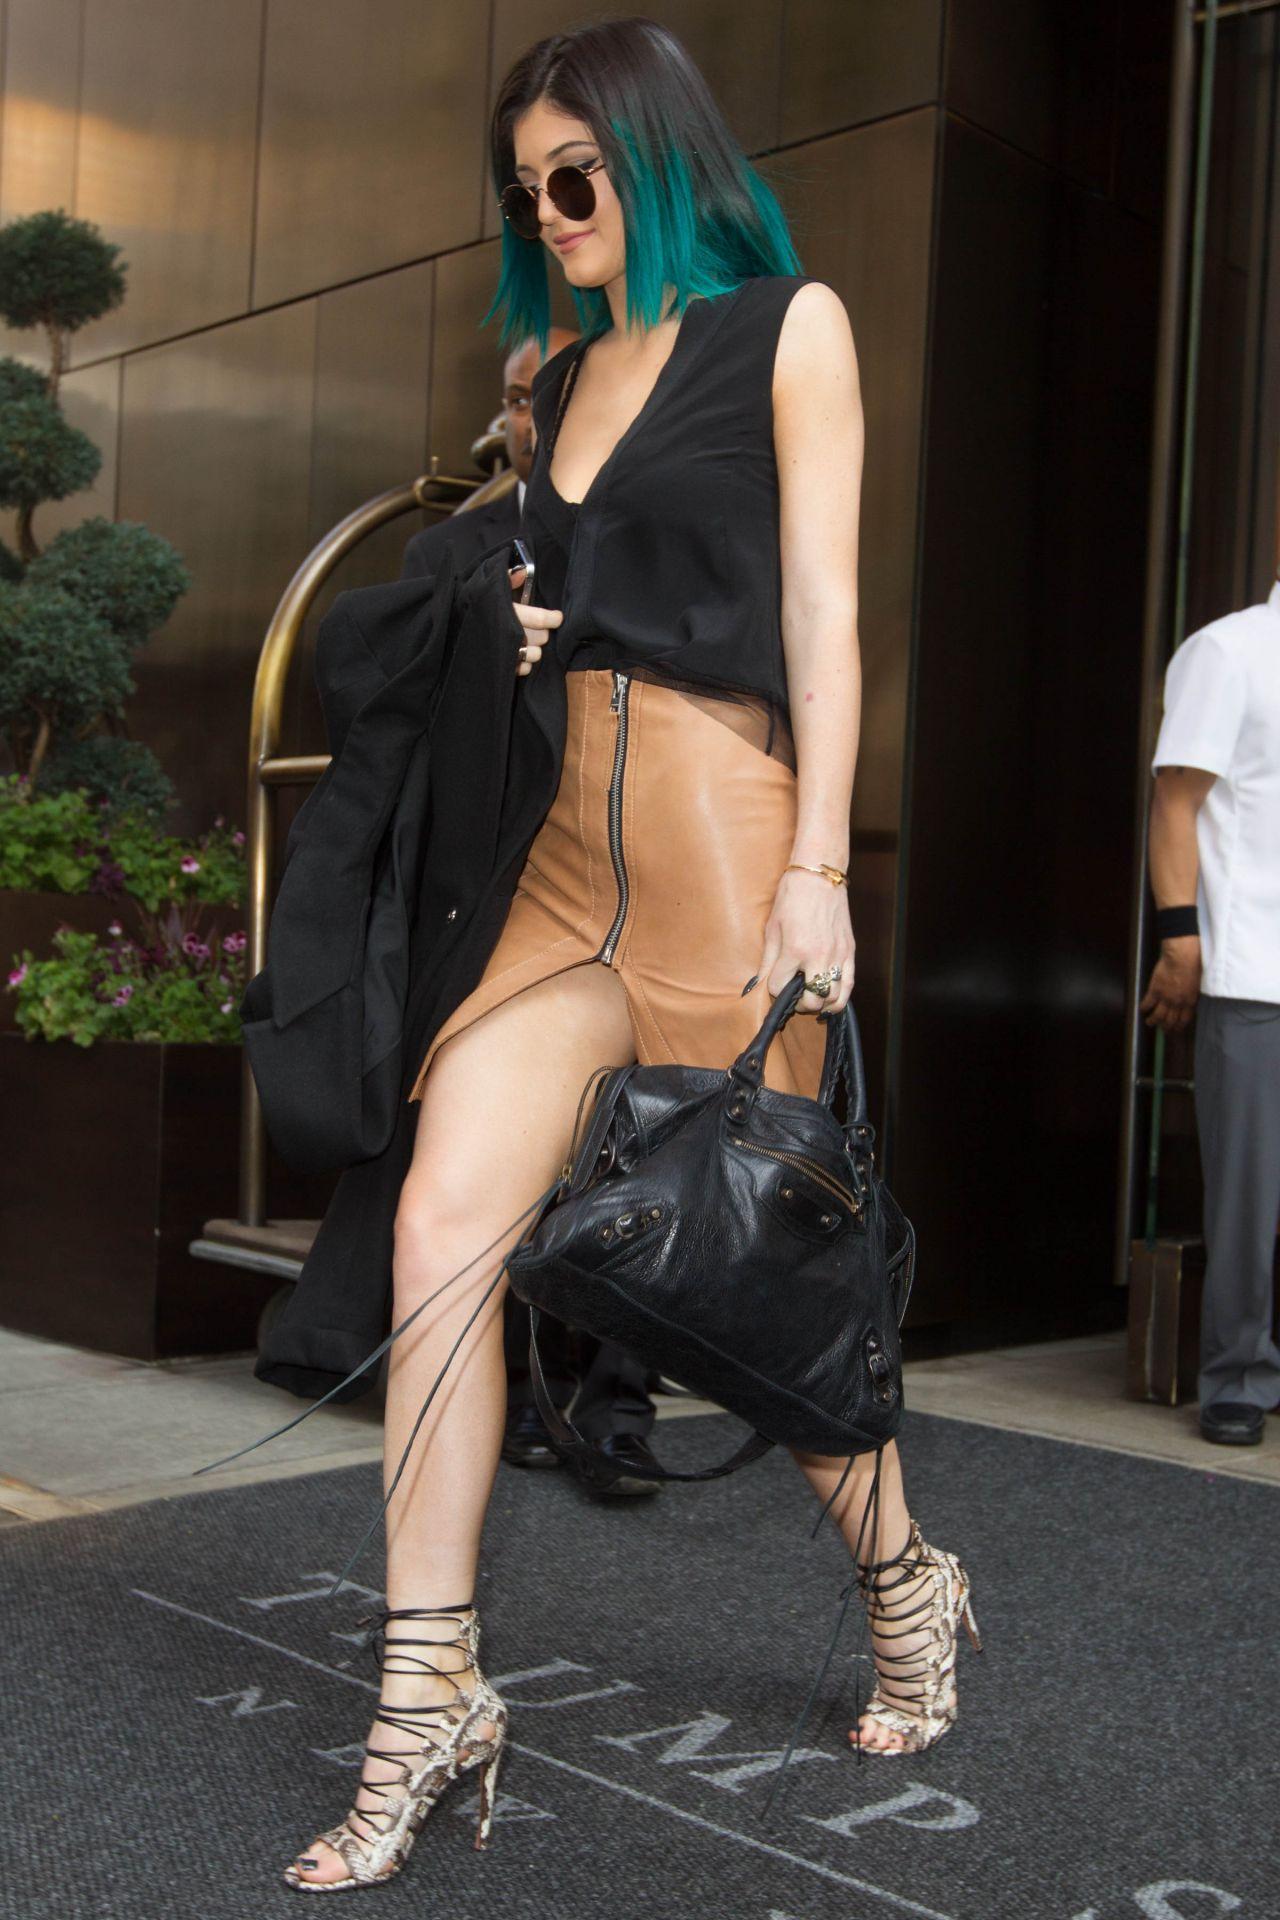 Kylie Jenner Shows Off Her Legs In Mini Skirt Leaving The